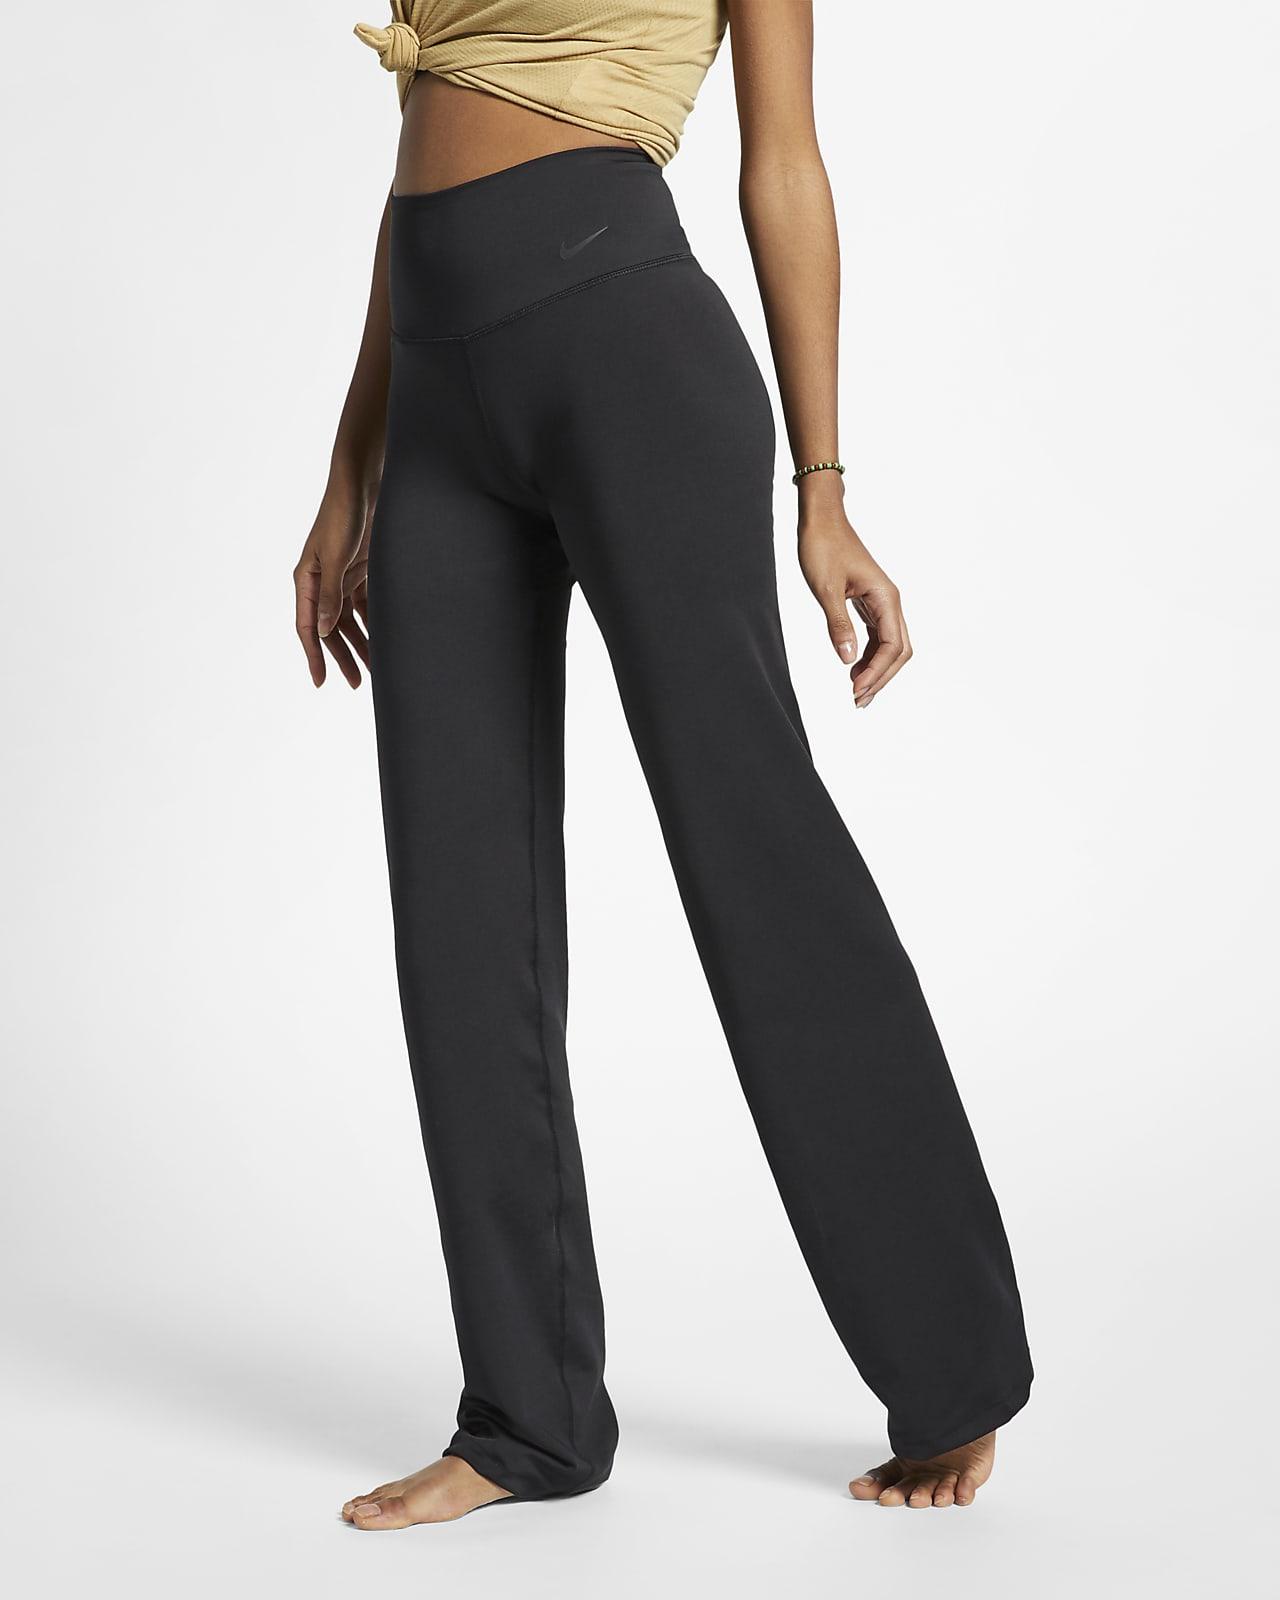 Nike Power Women's Yoga Training Trousers